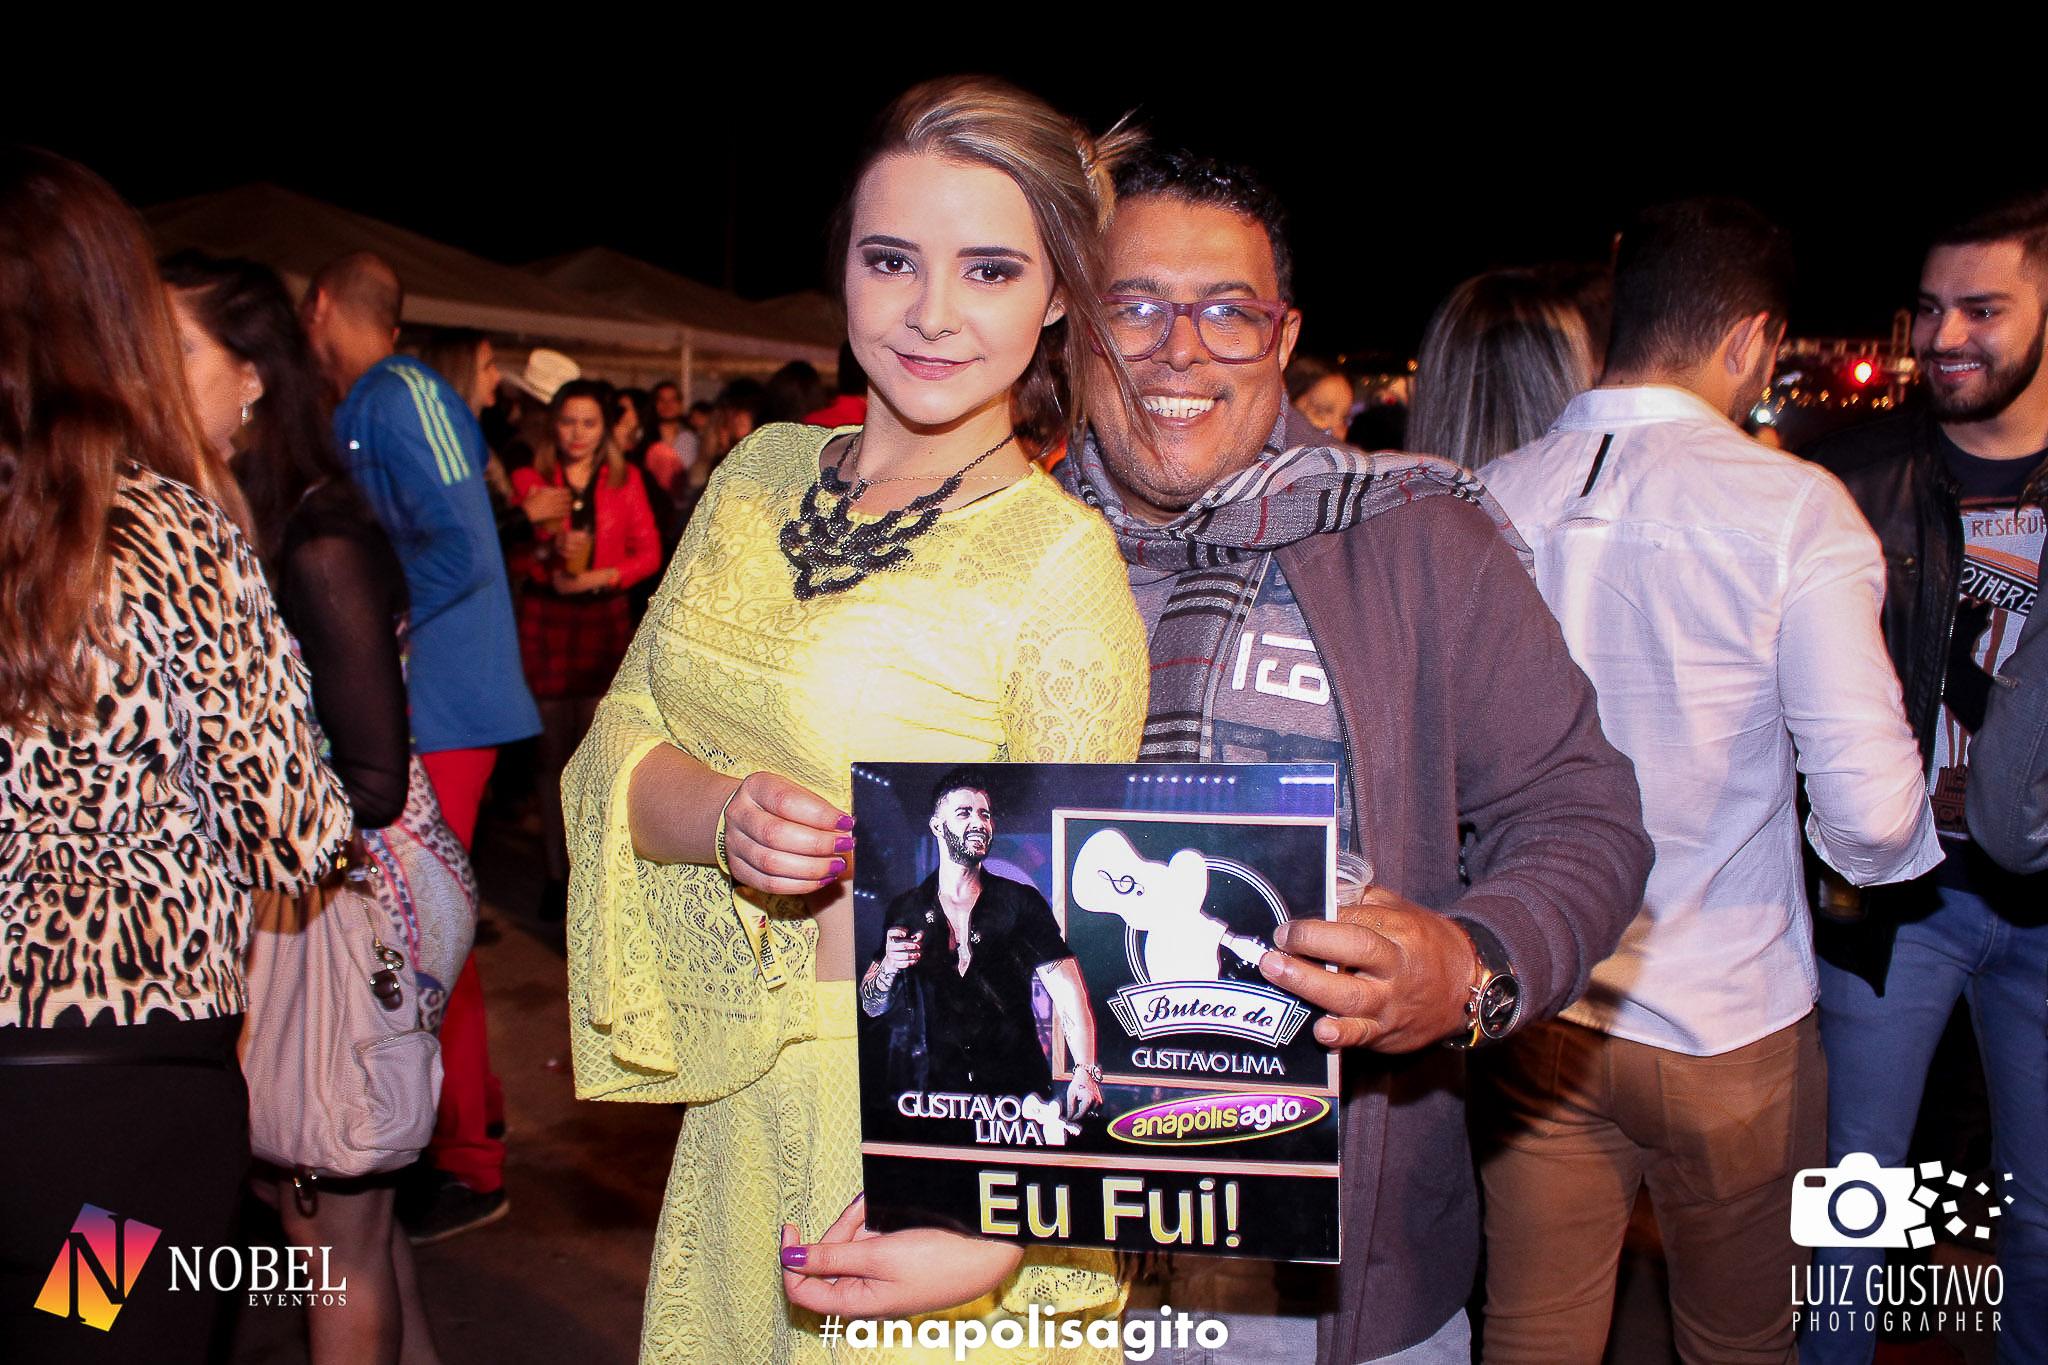 Luiz Gustavo Photographer-178